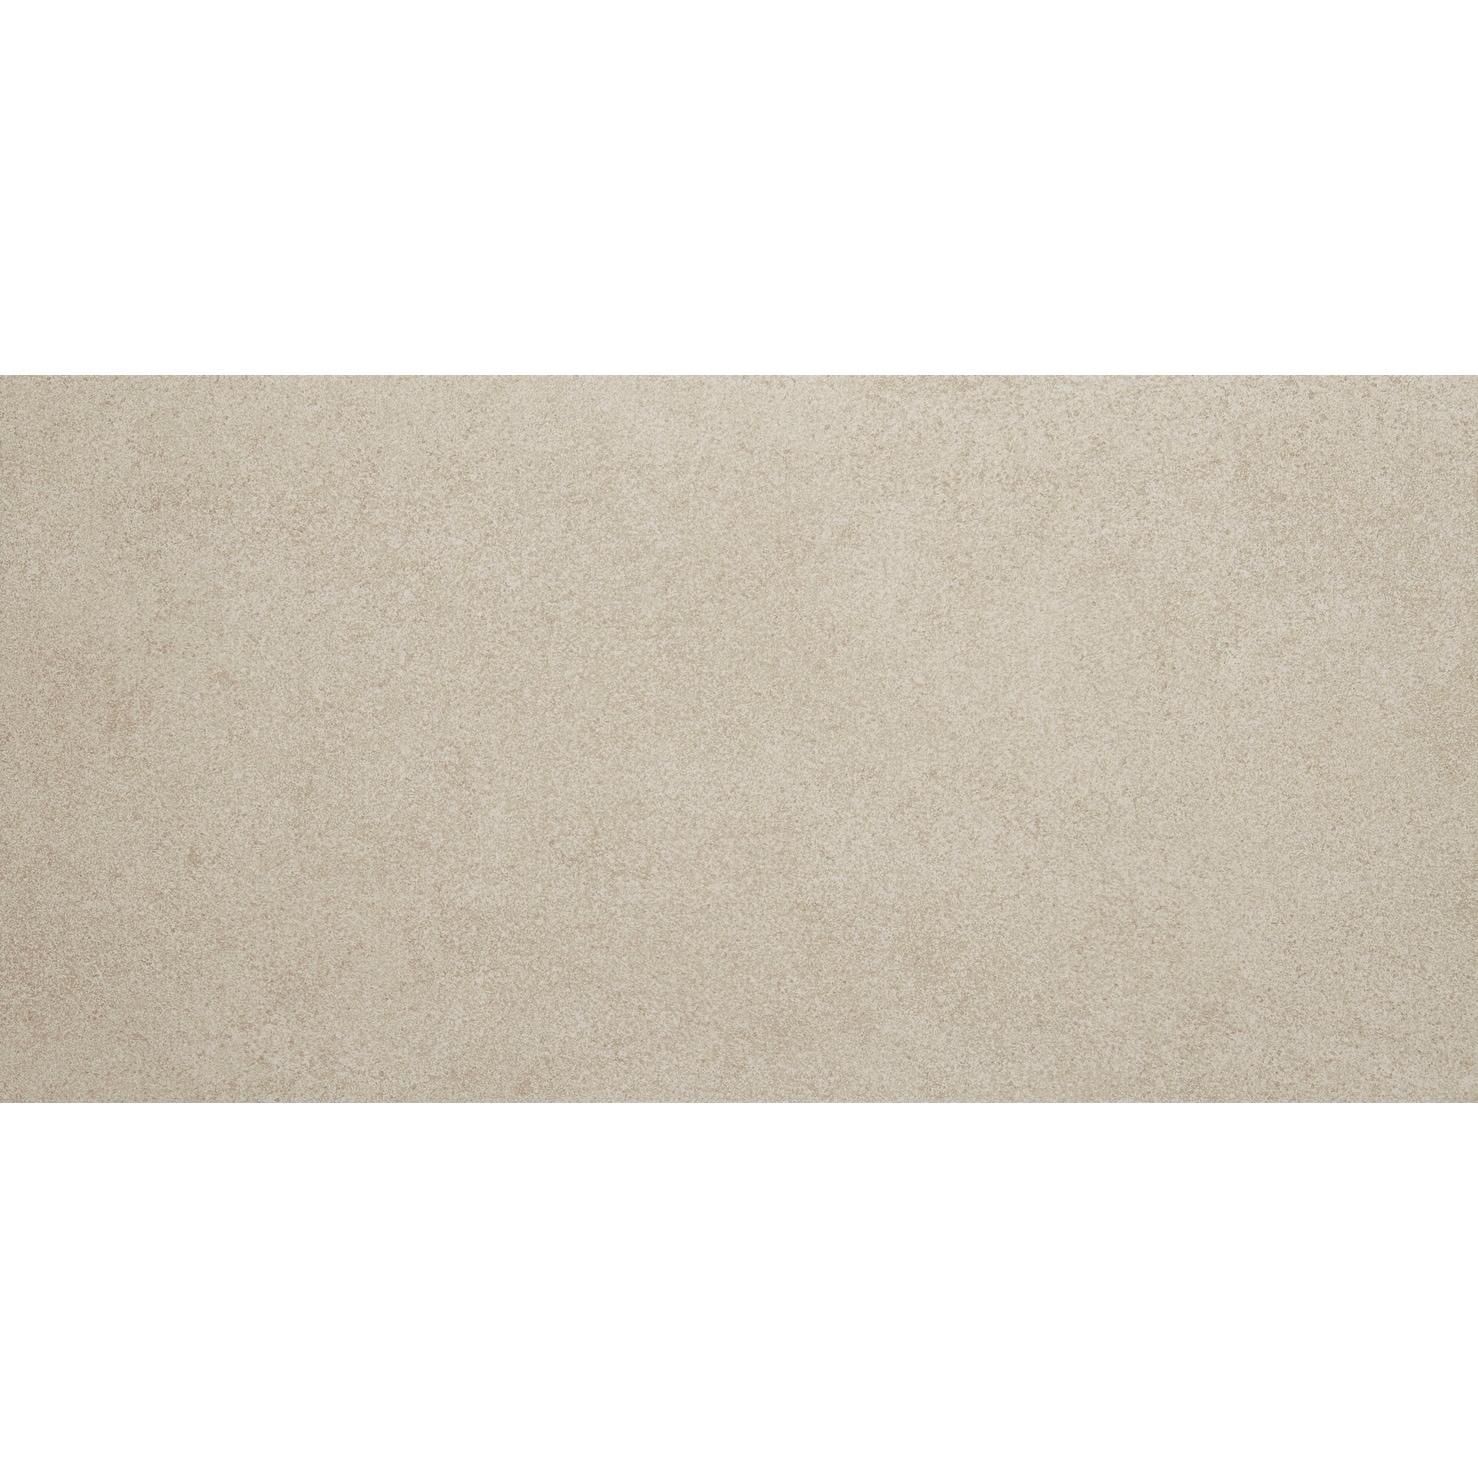 Contemporary Cement Visual 12x24 Inch Ceramic Floor Tile In Beige 12x24 Overstock 20771918